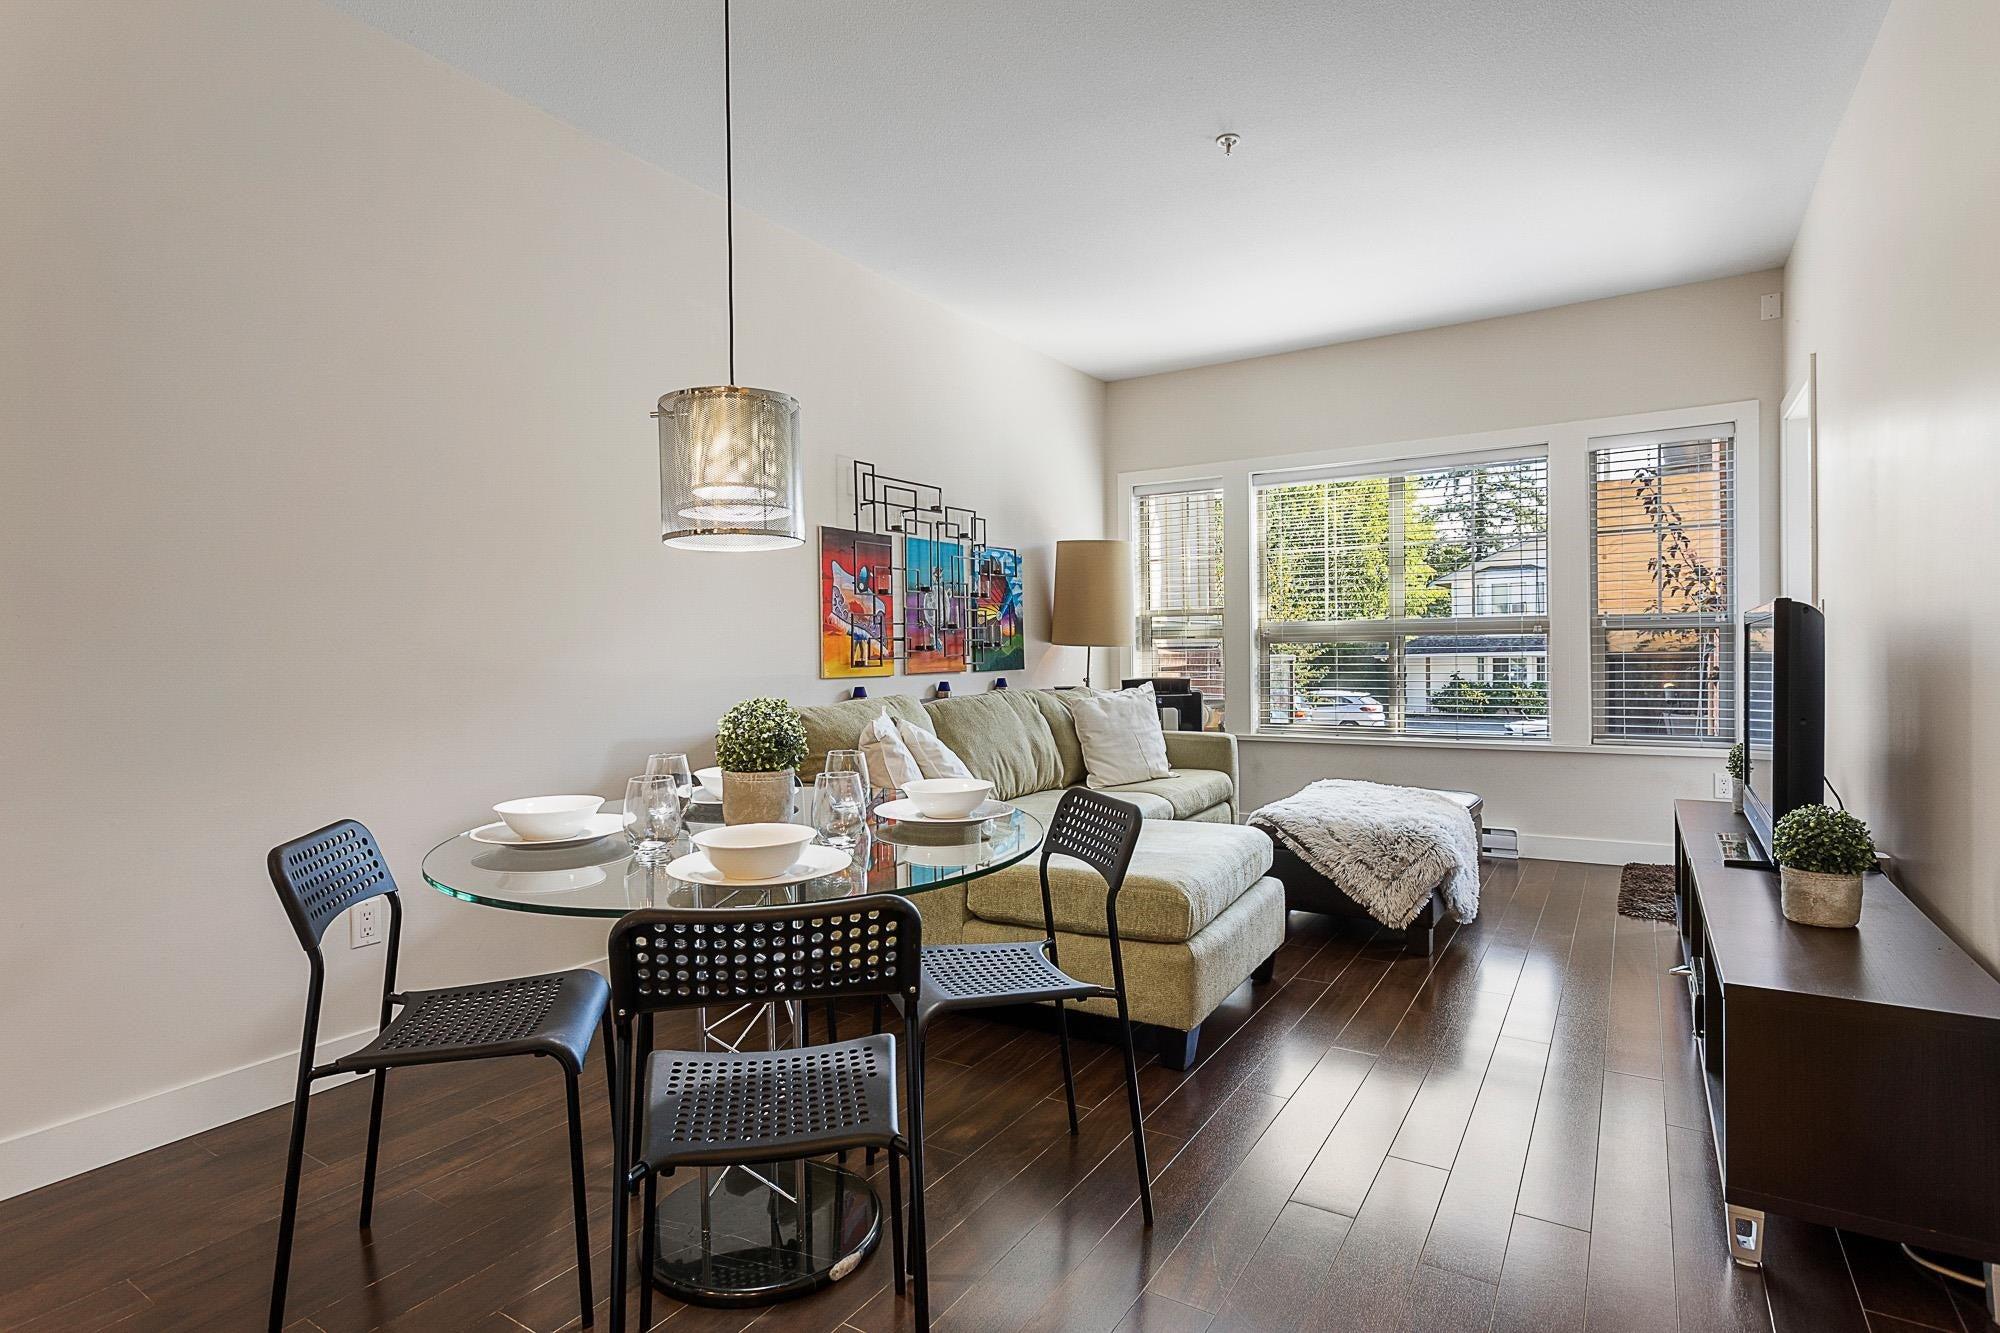 114 20219 54A AVENUE - Langley City Apartment/Condo for sale, 1 Bedroom (R2616172) - #9